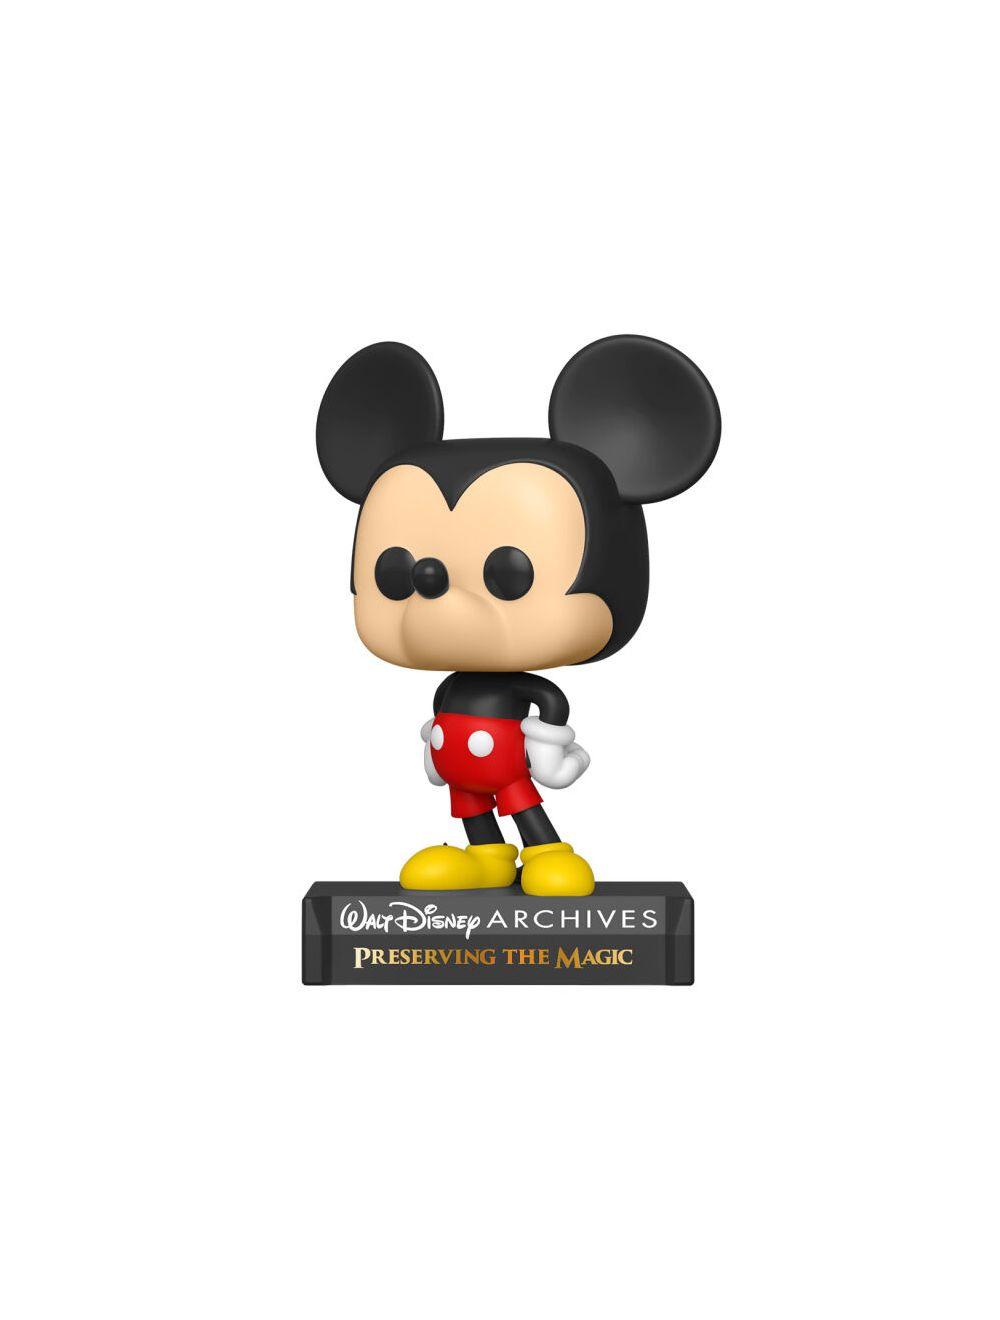 Funko POP! Disney Archives - Mickey Mouse Vinyl Figura 10cm